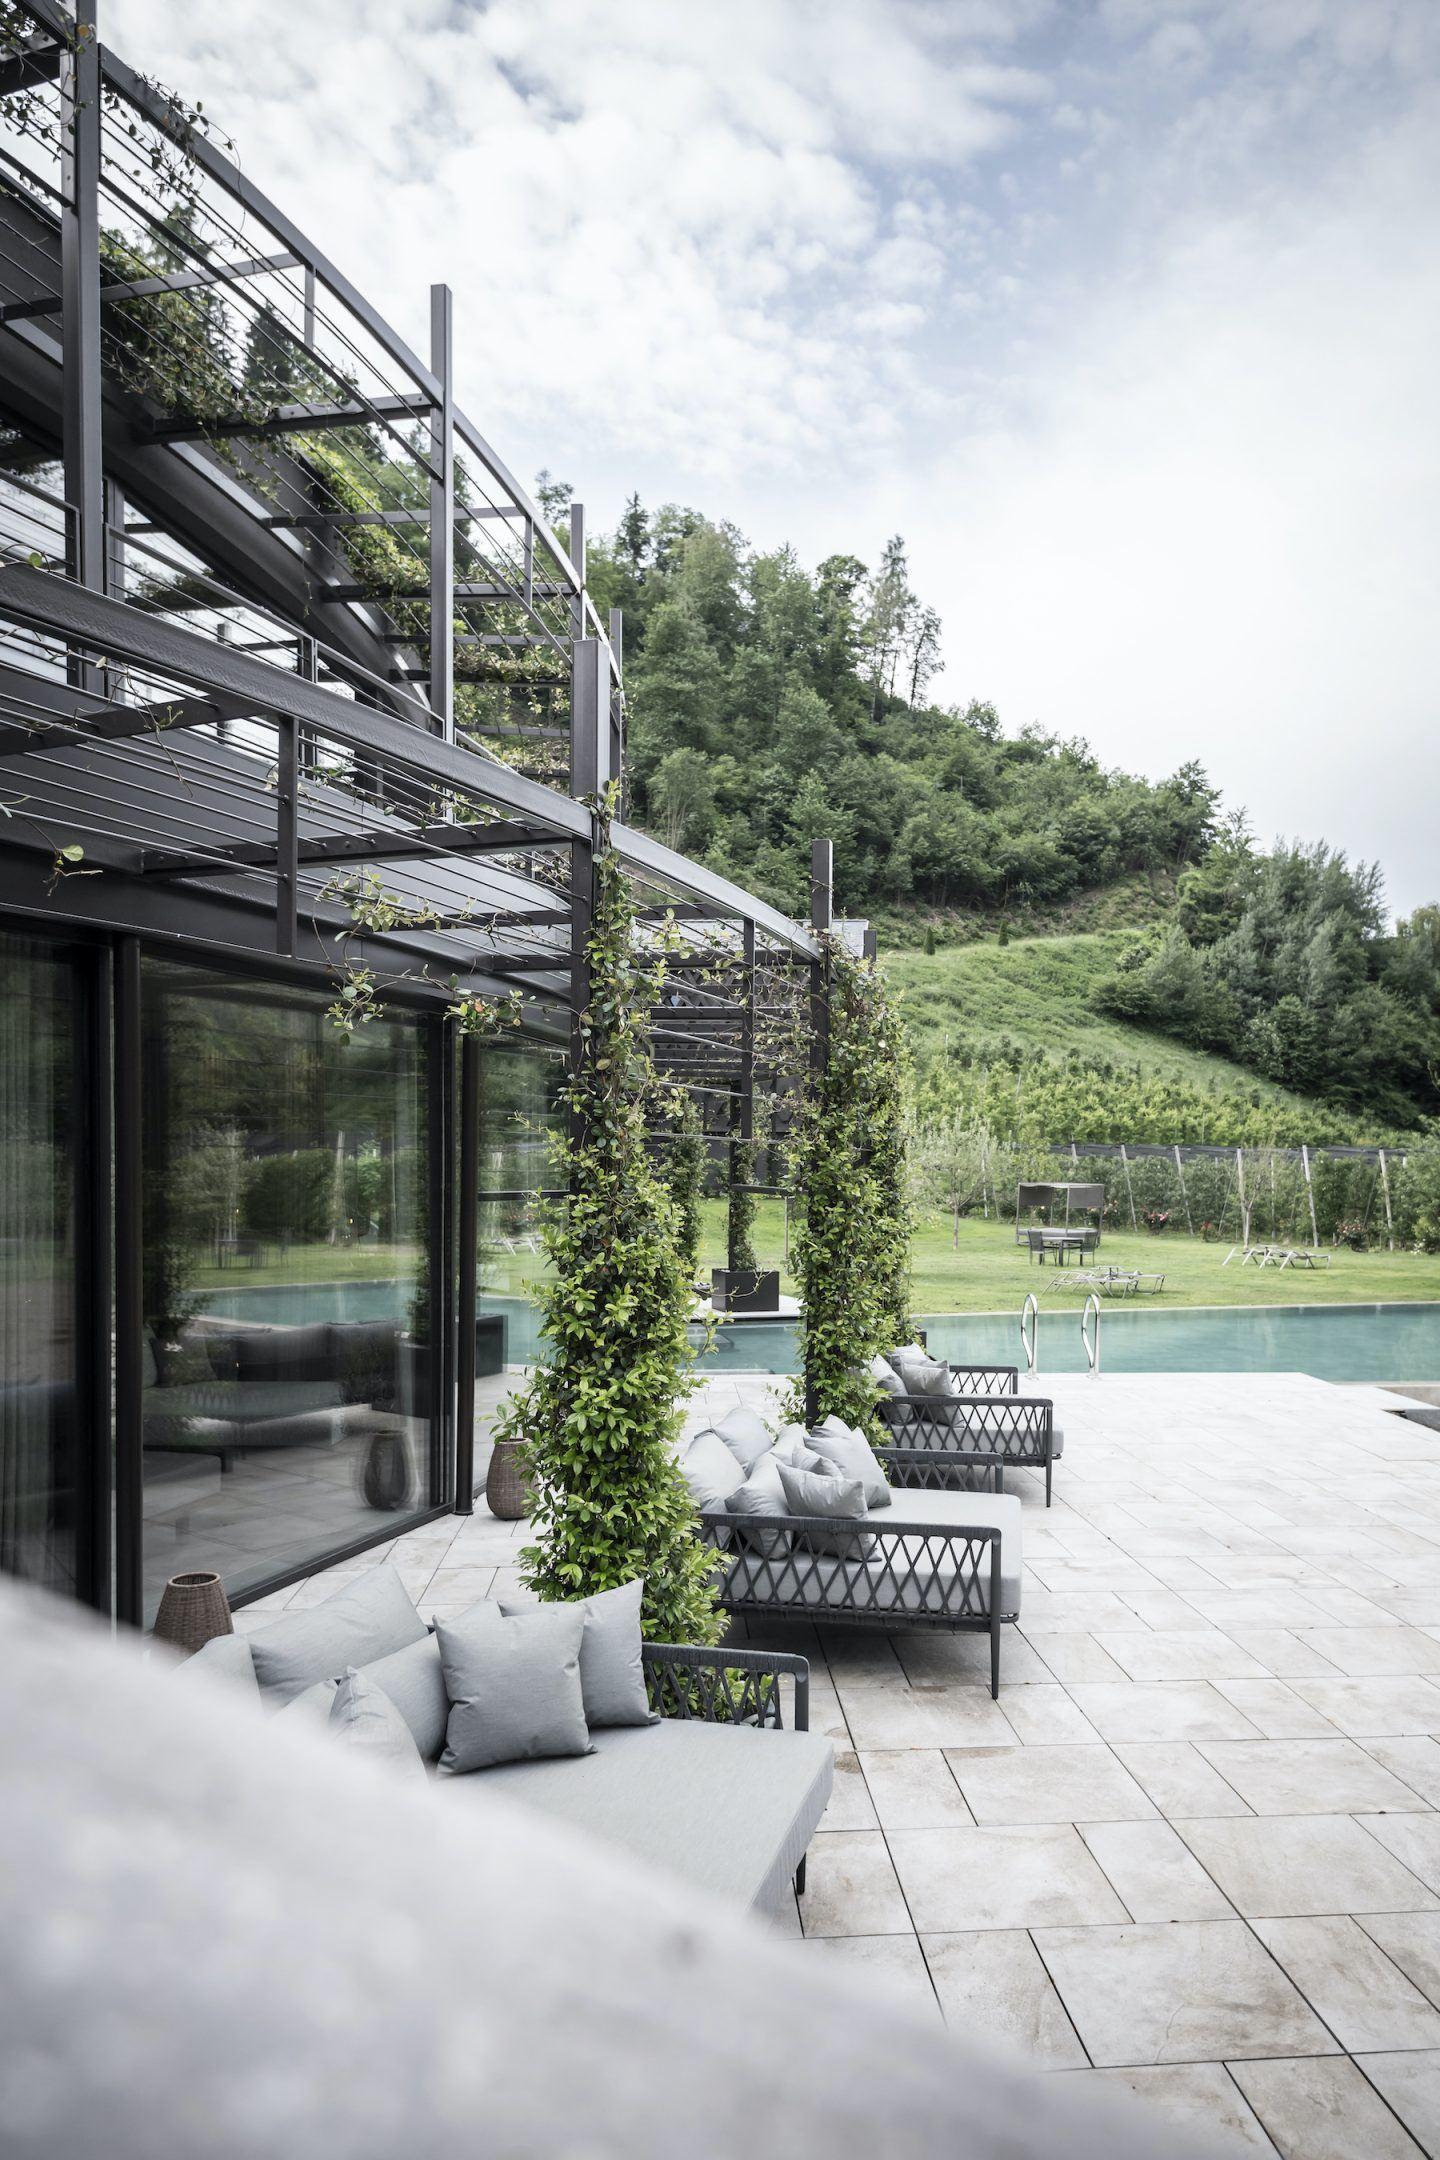 IGNANT-Travel-Apfelhotel-Torgglerhof-NOA-010